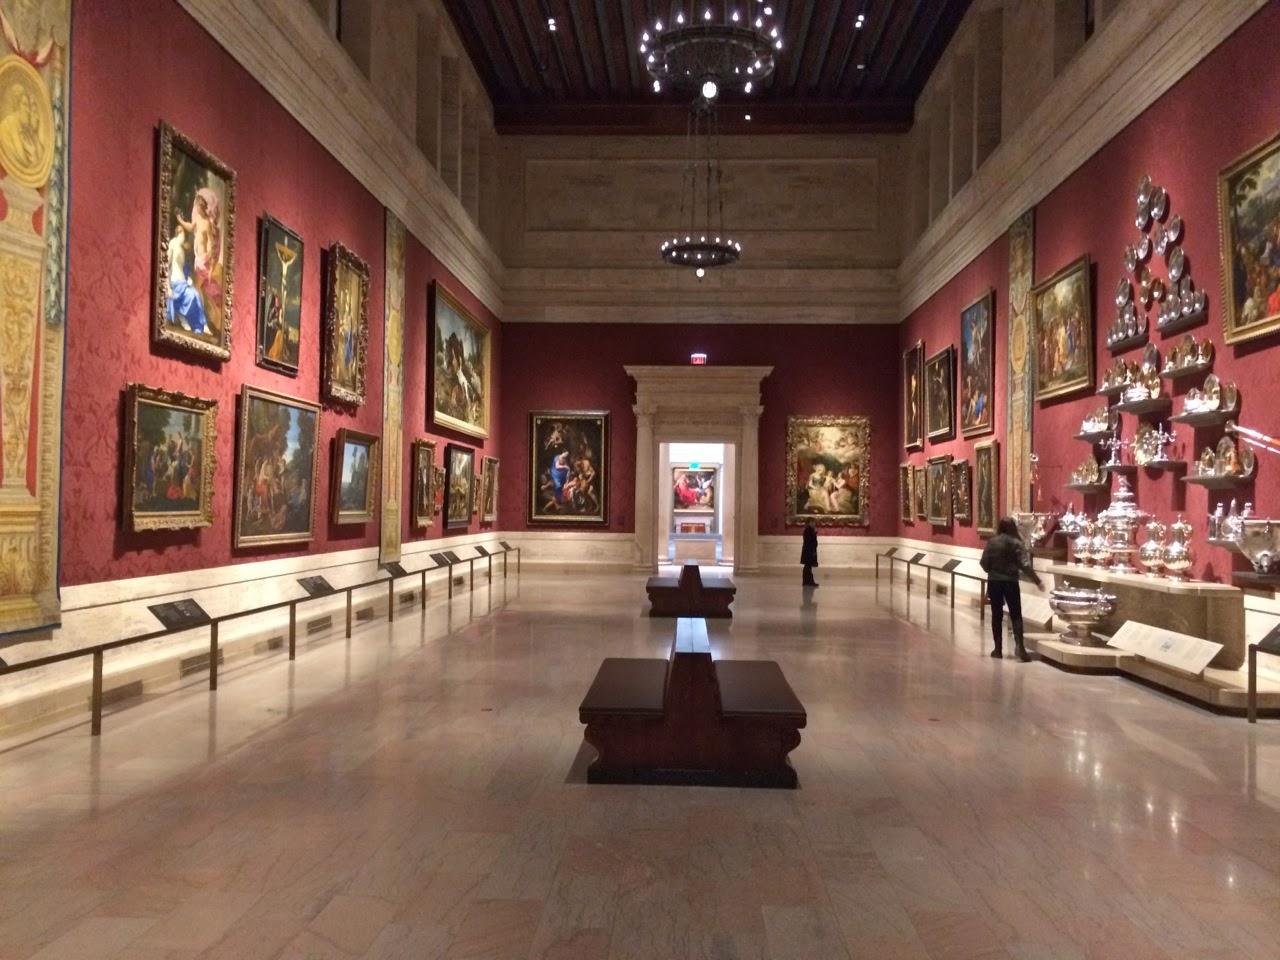 Left Bank Art Blog: More on my December Trip to Boston